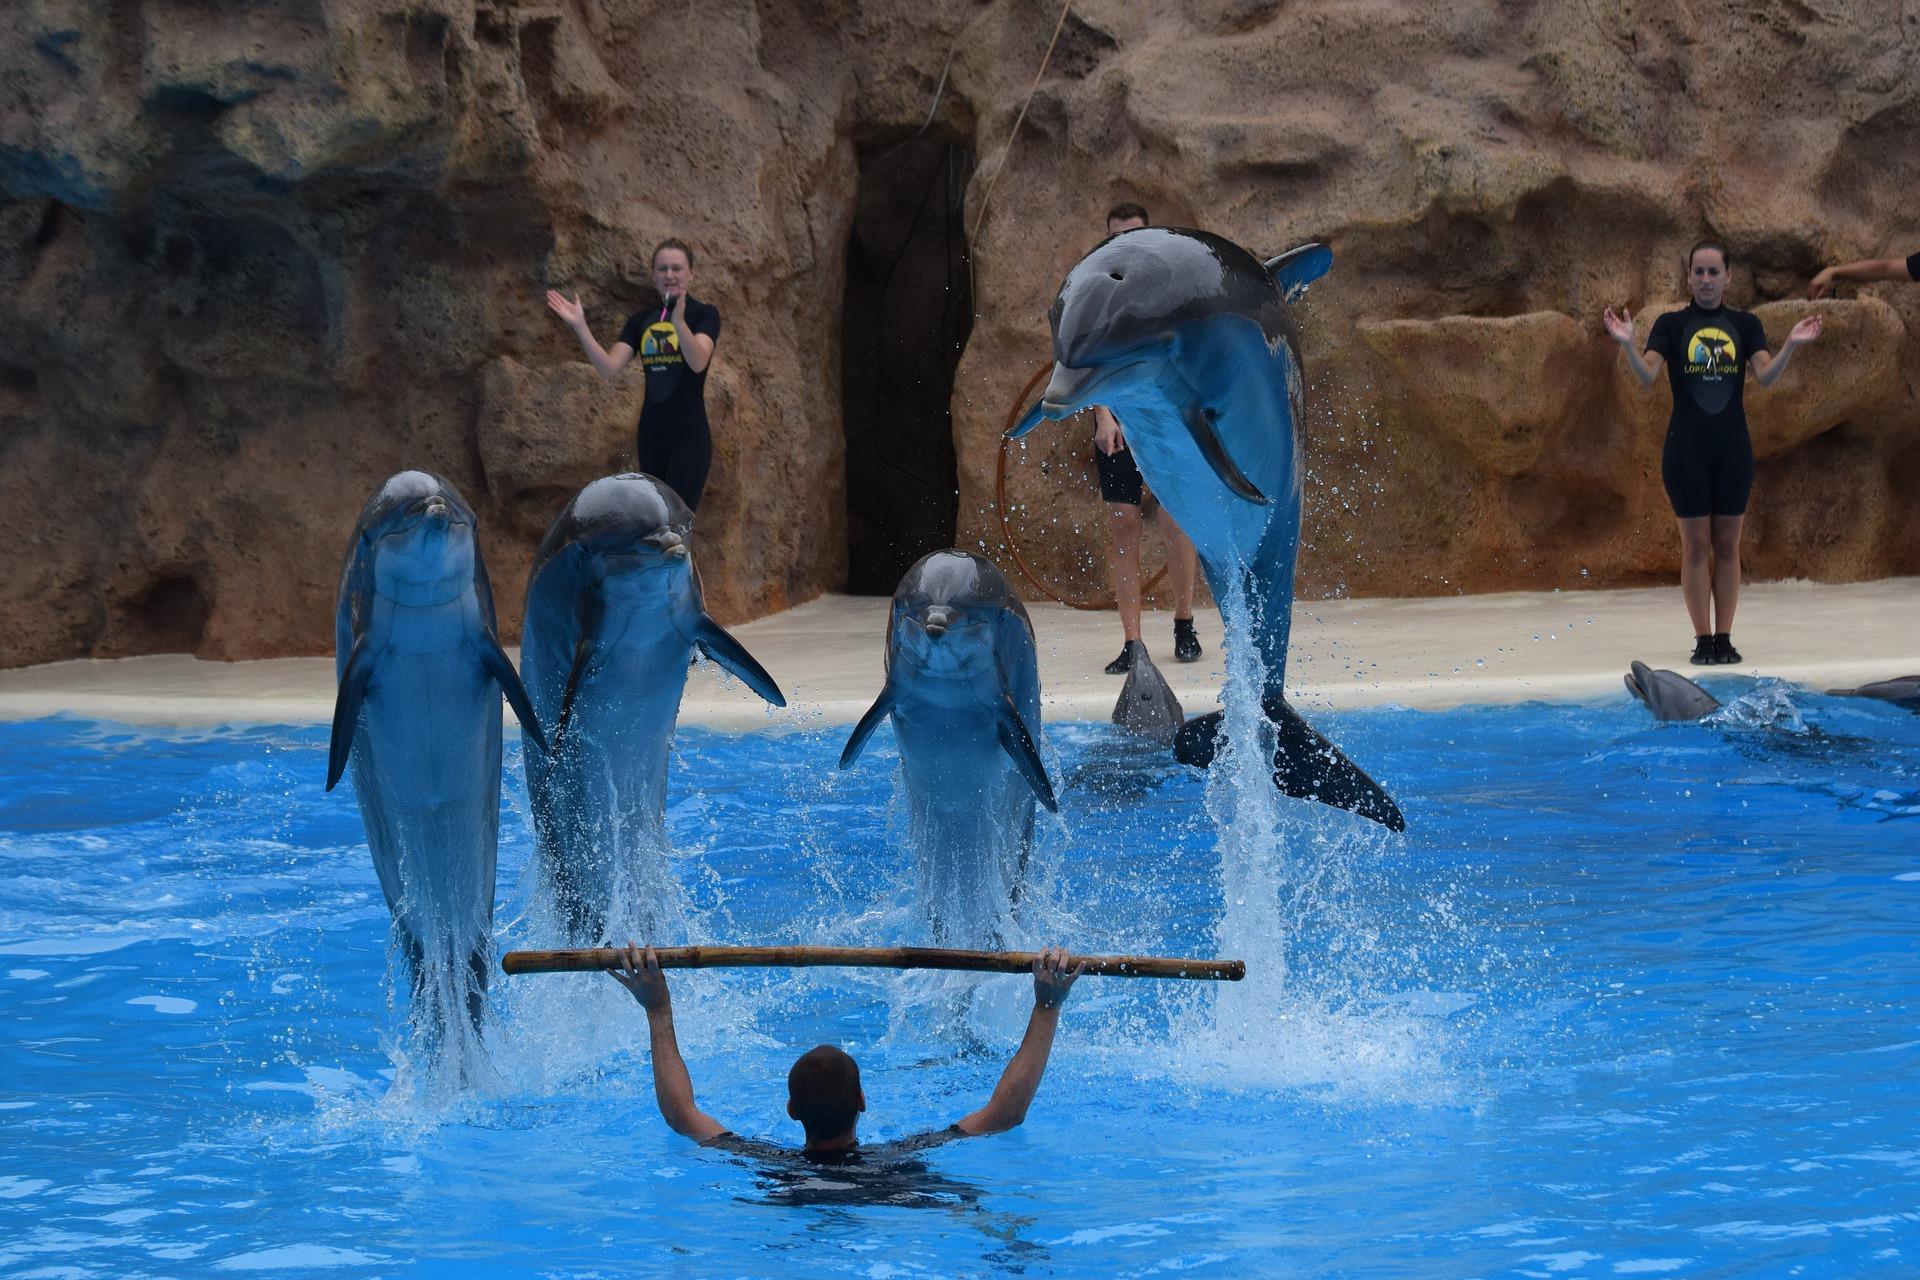 loro parque zoológico de tenerife